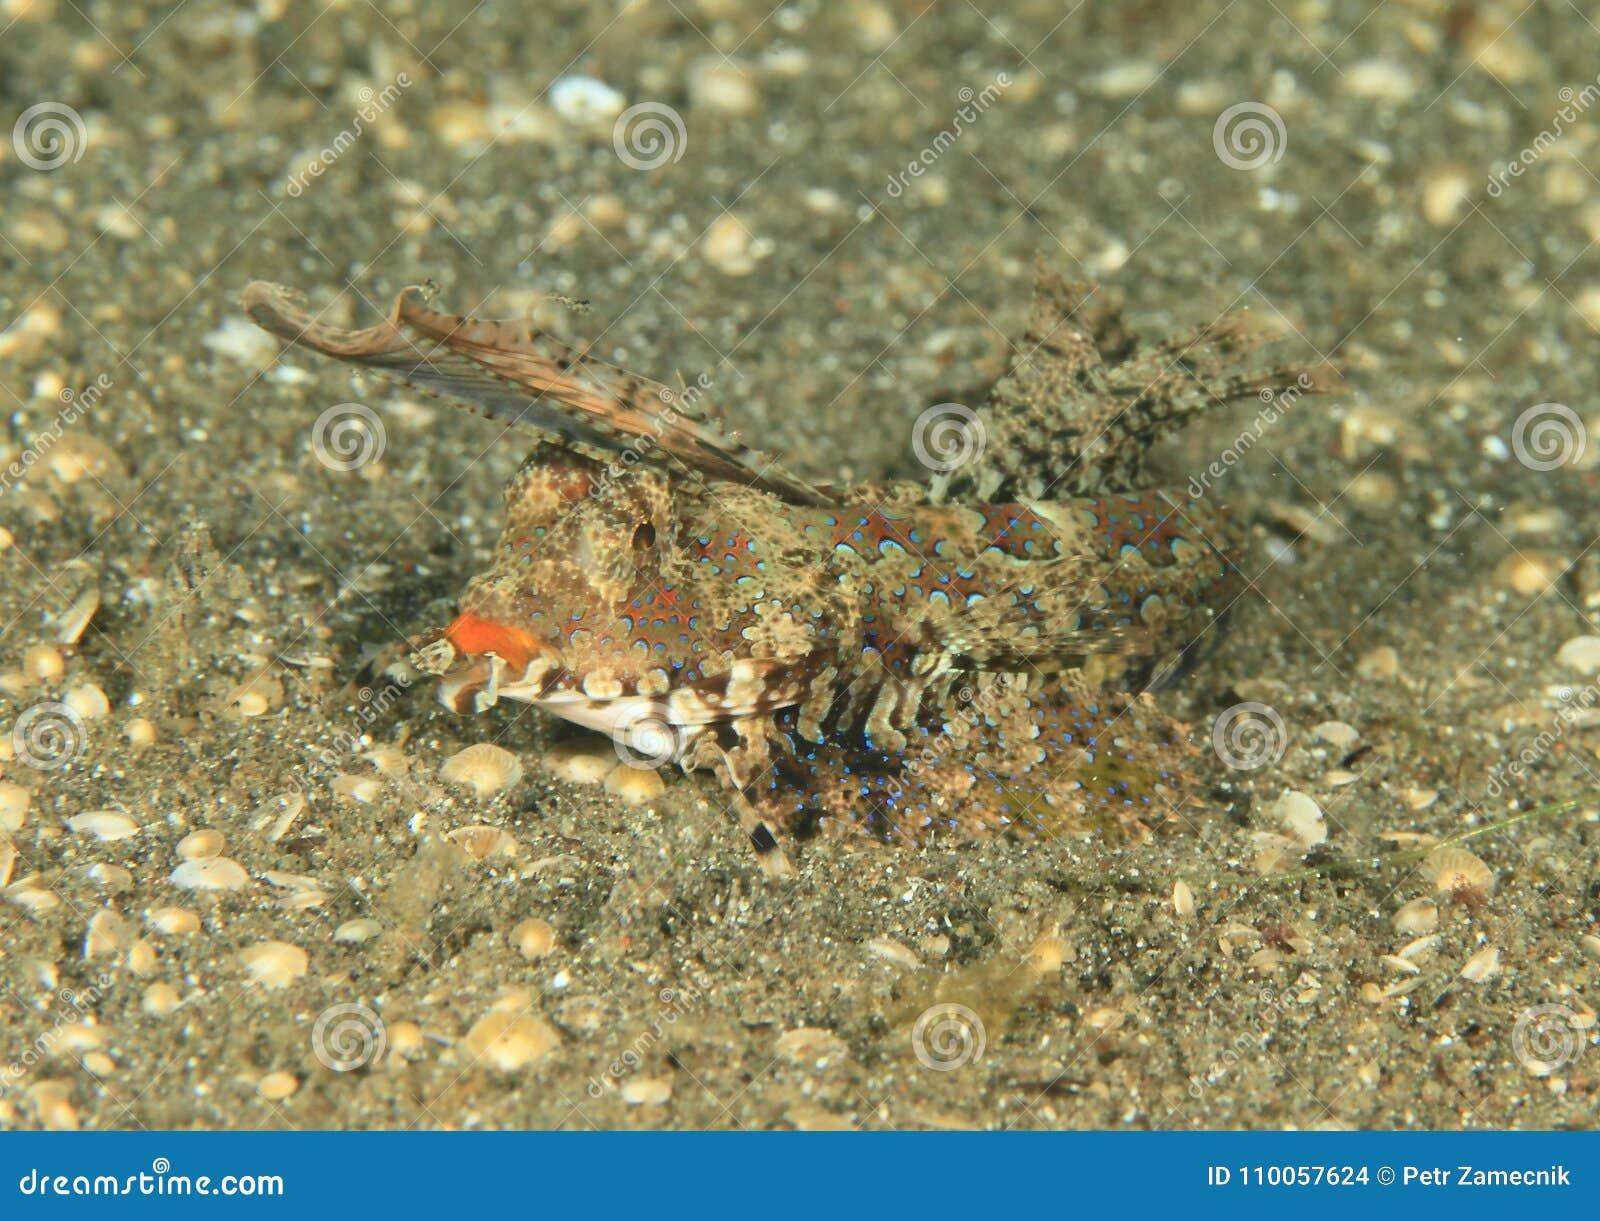 Fish - Orange and black dragonet